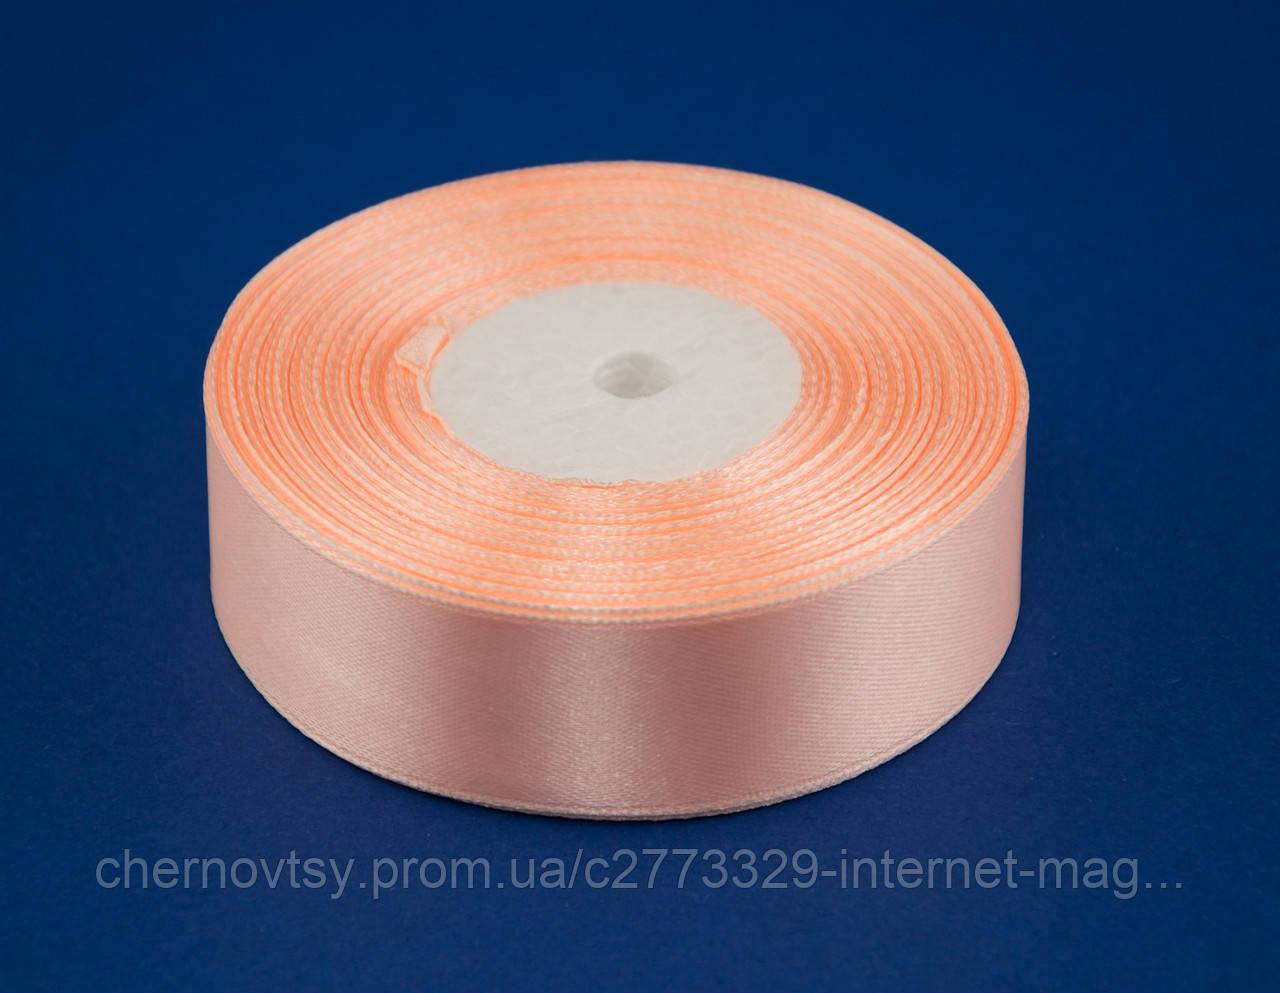 Лента атлас 0.6 см, 33 м, № 07 нежно персиковая